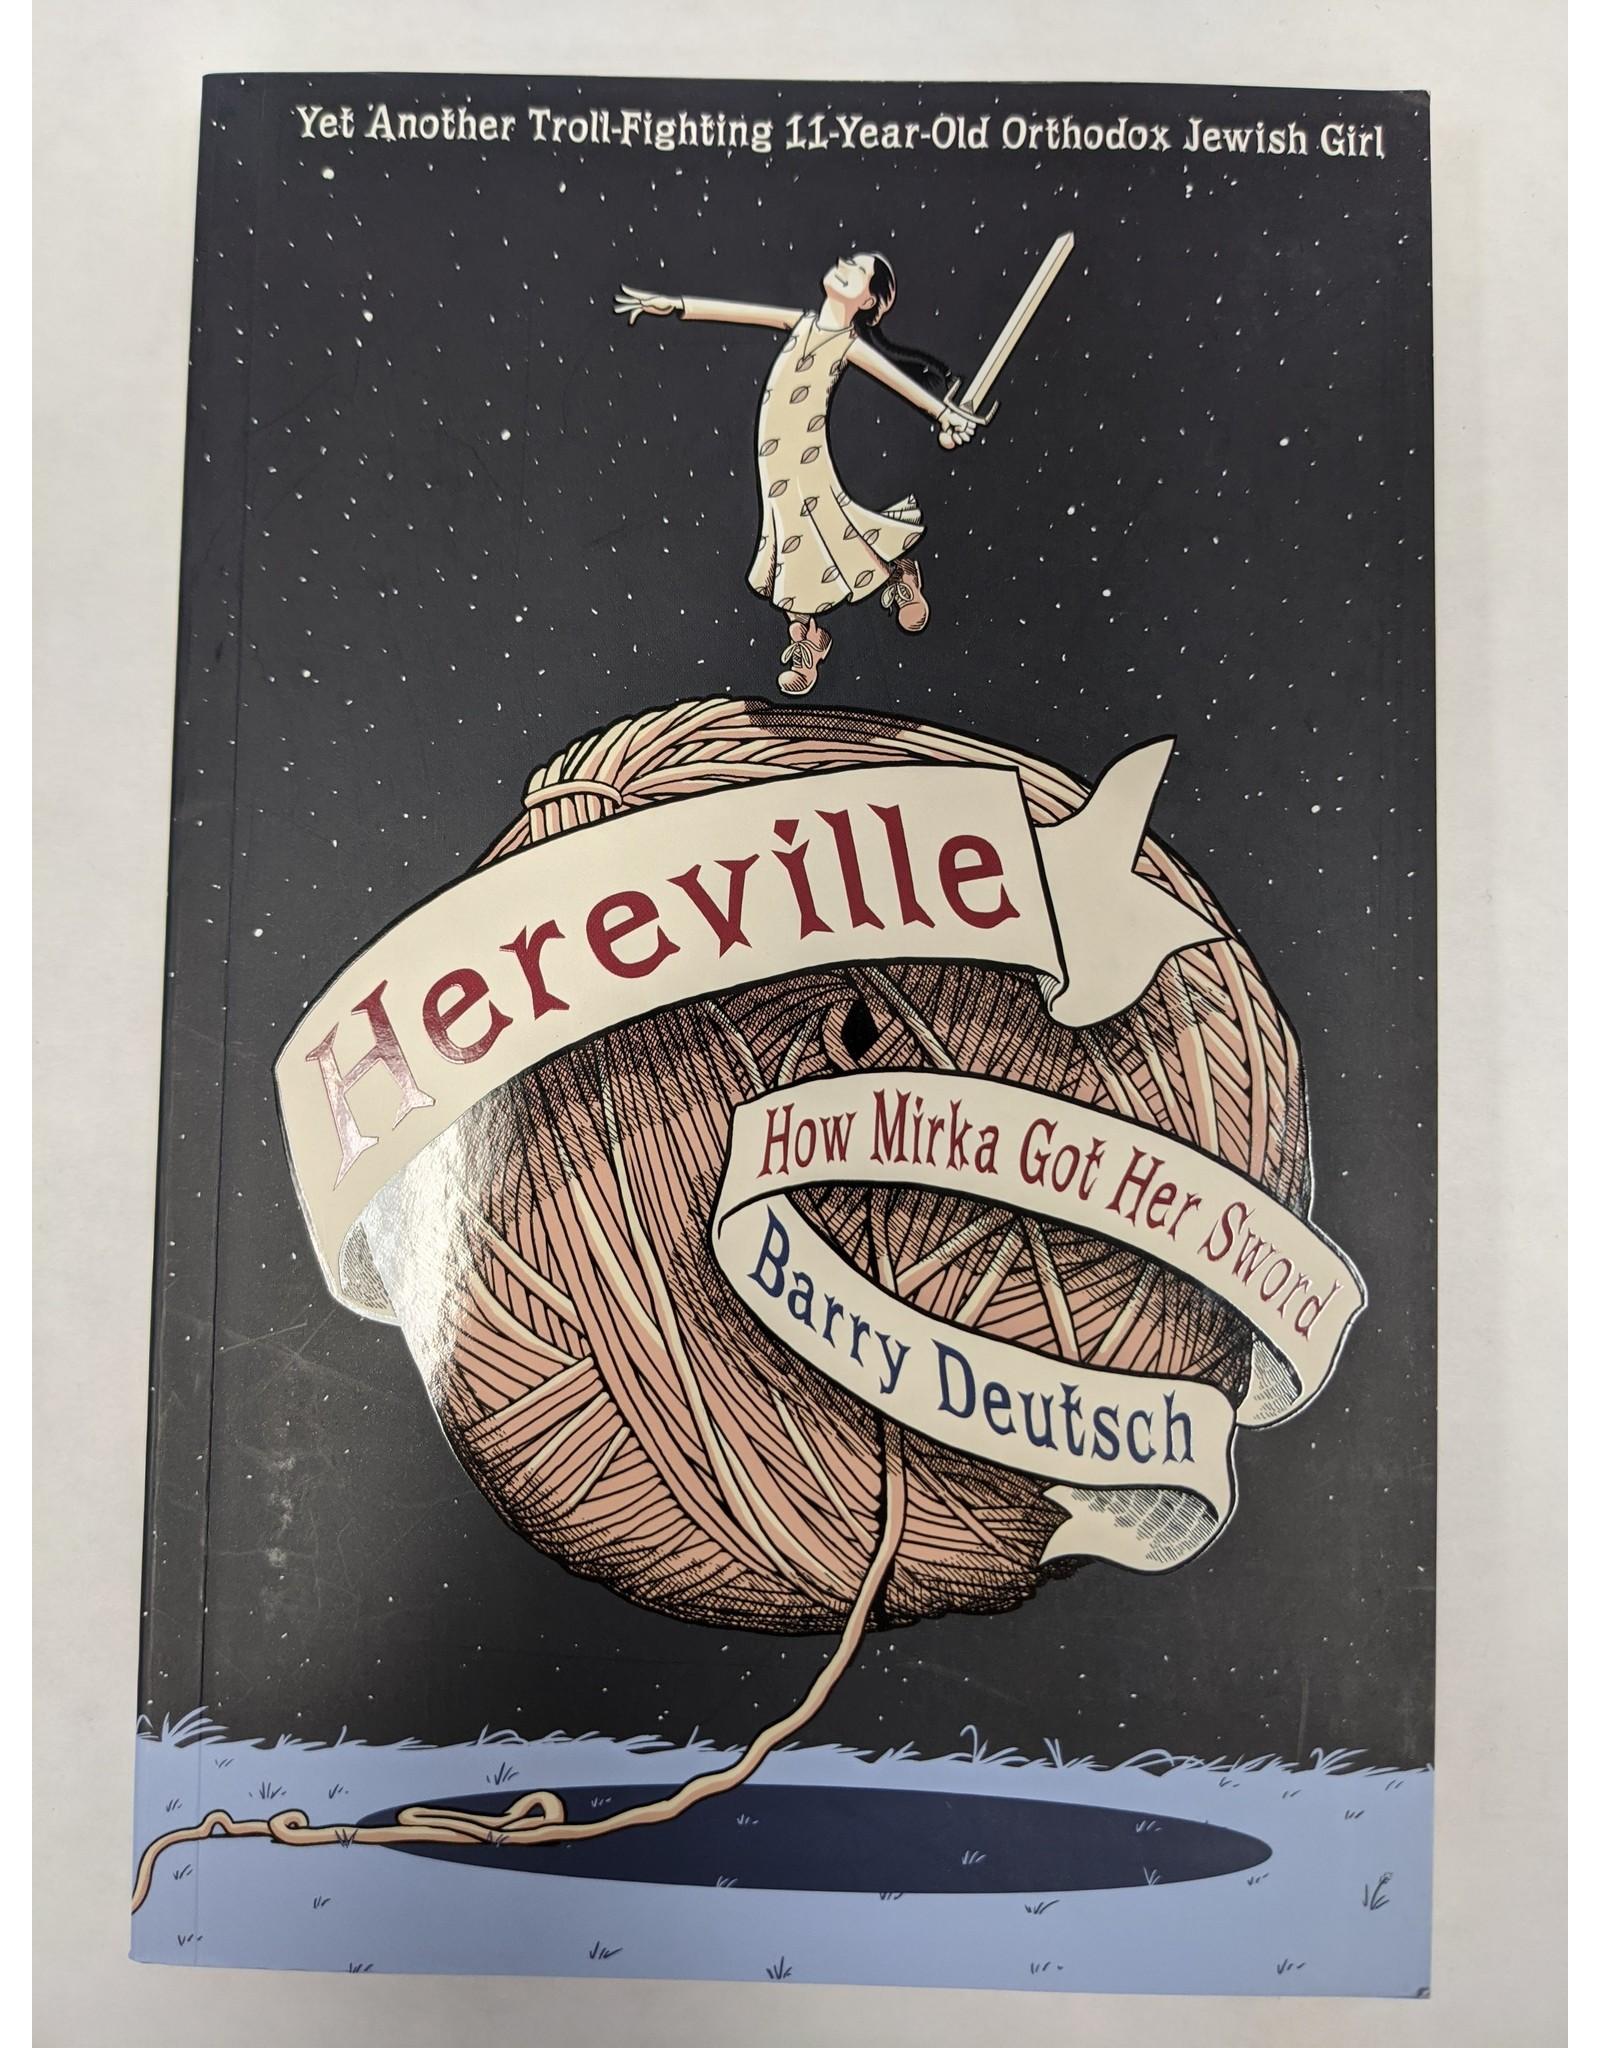 AMULET BOOKS HEREVILLE: HOW MIRKA GOT HER SWORD